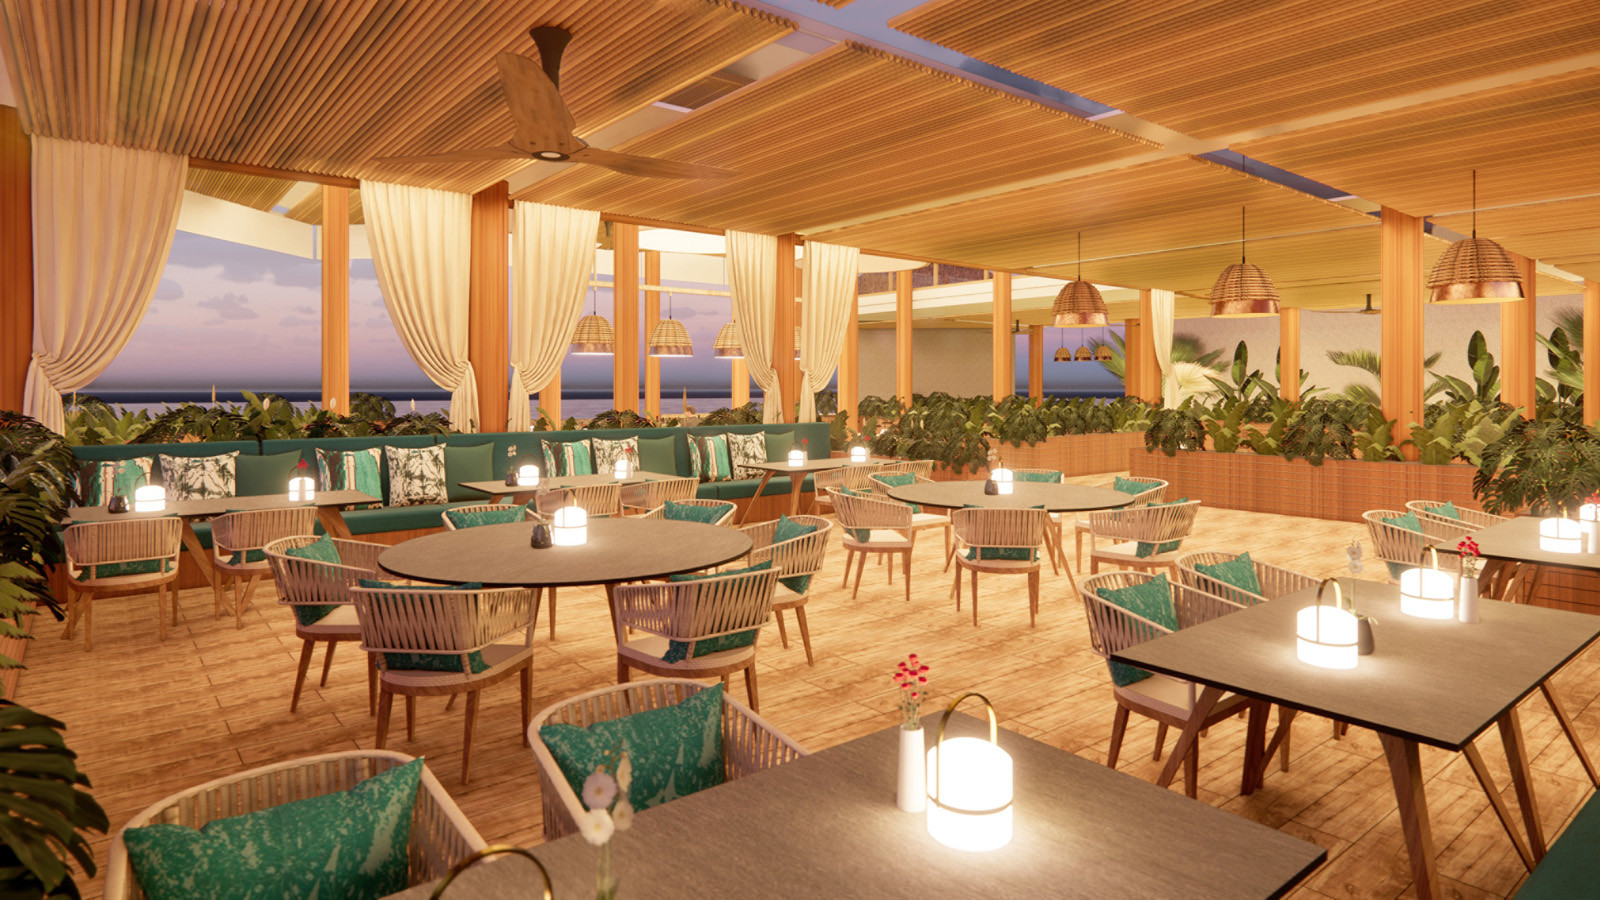 news-main-four-seasons-resort-mauritius-at-anahita-announces-a-resort-culinary-transformation-through-restaurant-and-bar-renovations.1625758583.jpg